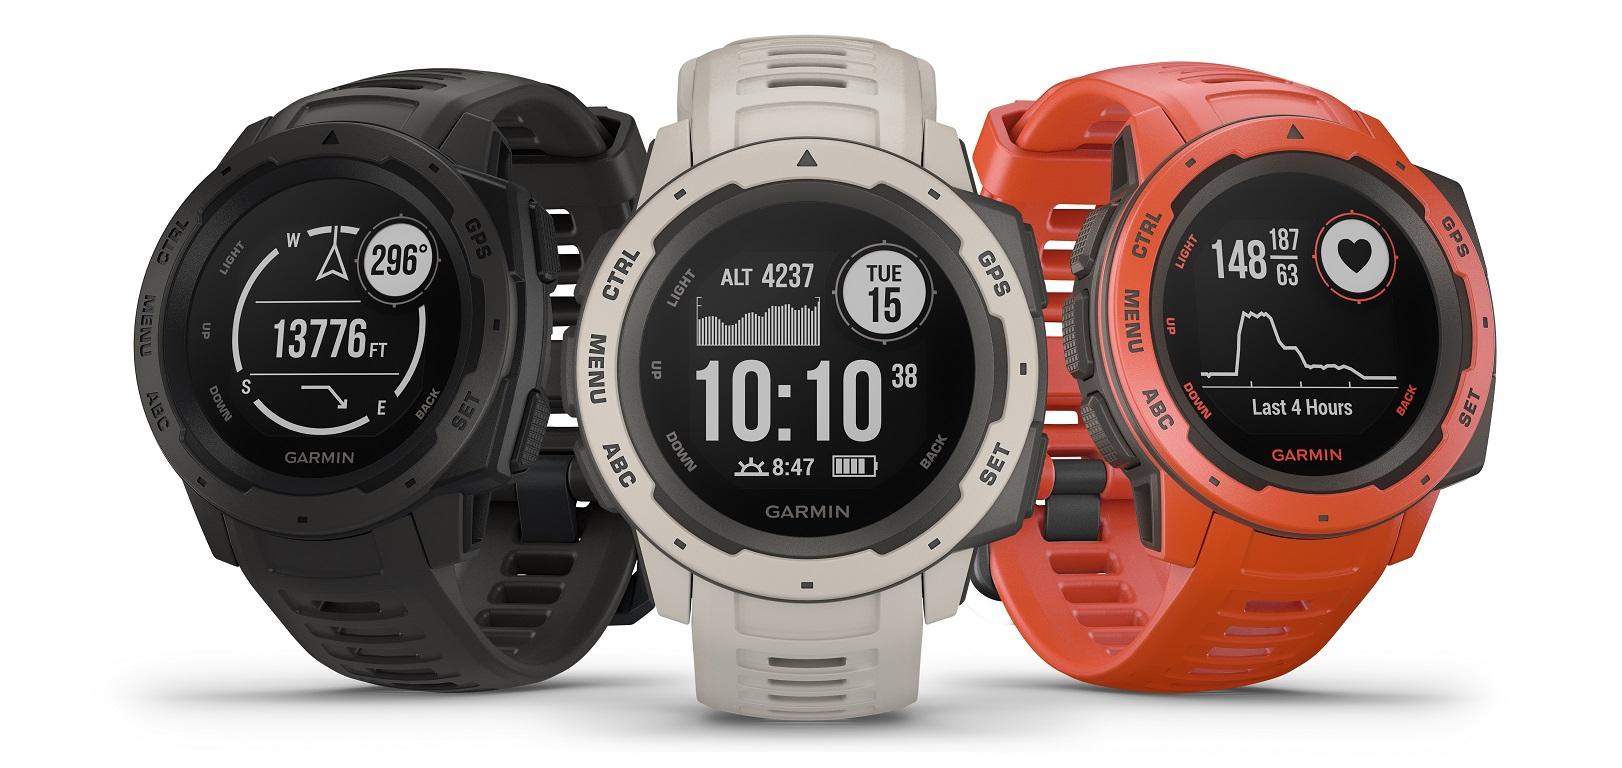 59210 Garmin Reportedly Working On Solar-Charging Instinct 2 Smartwatch